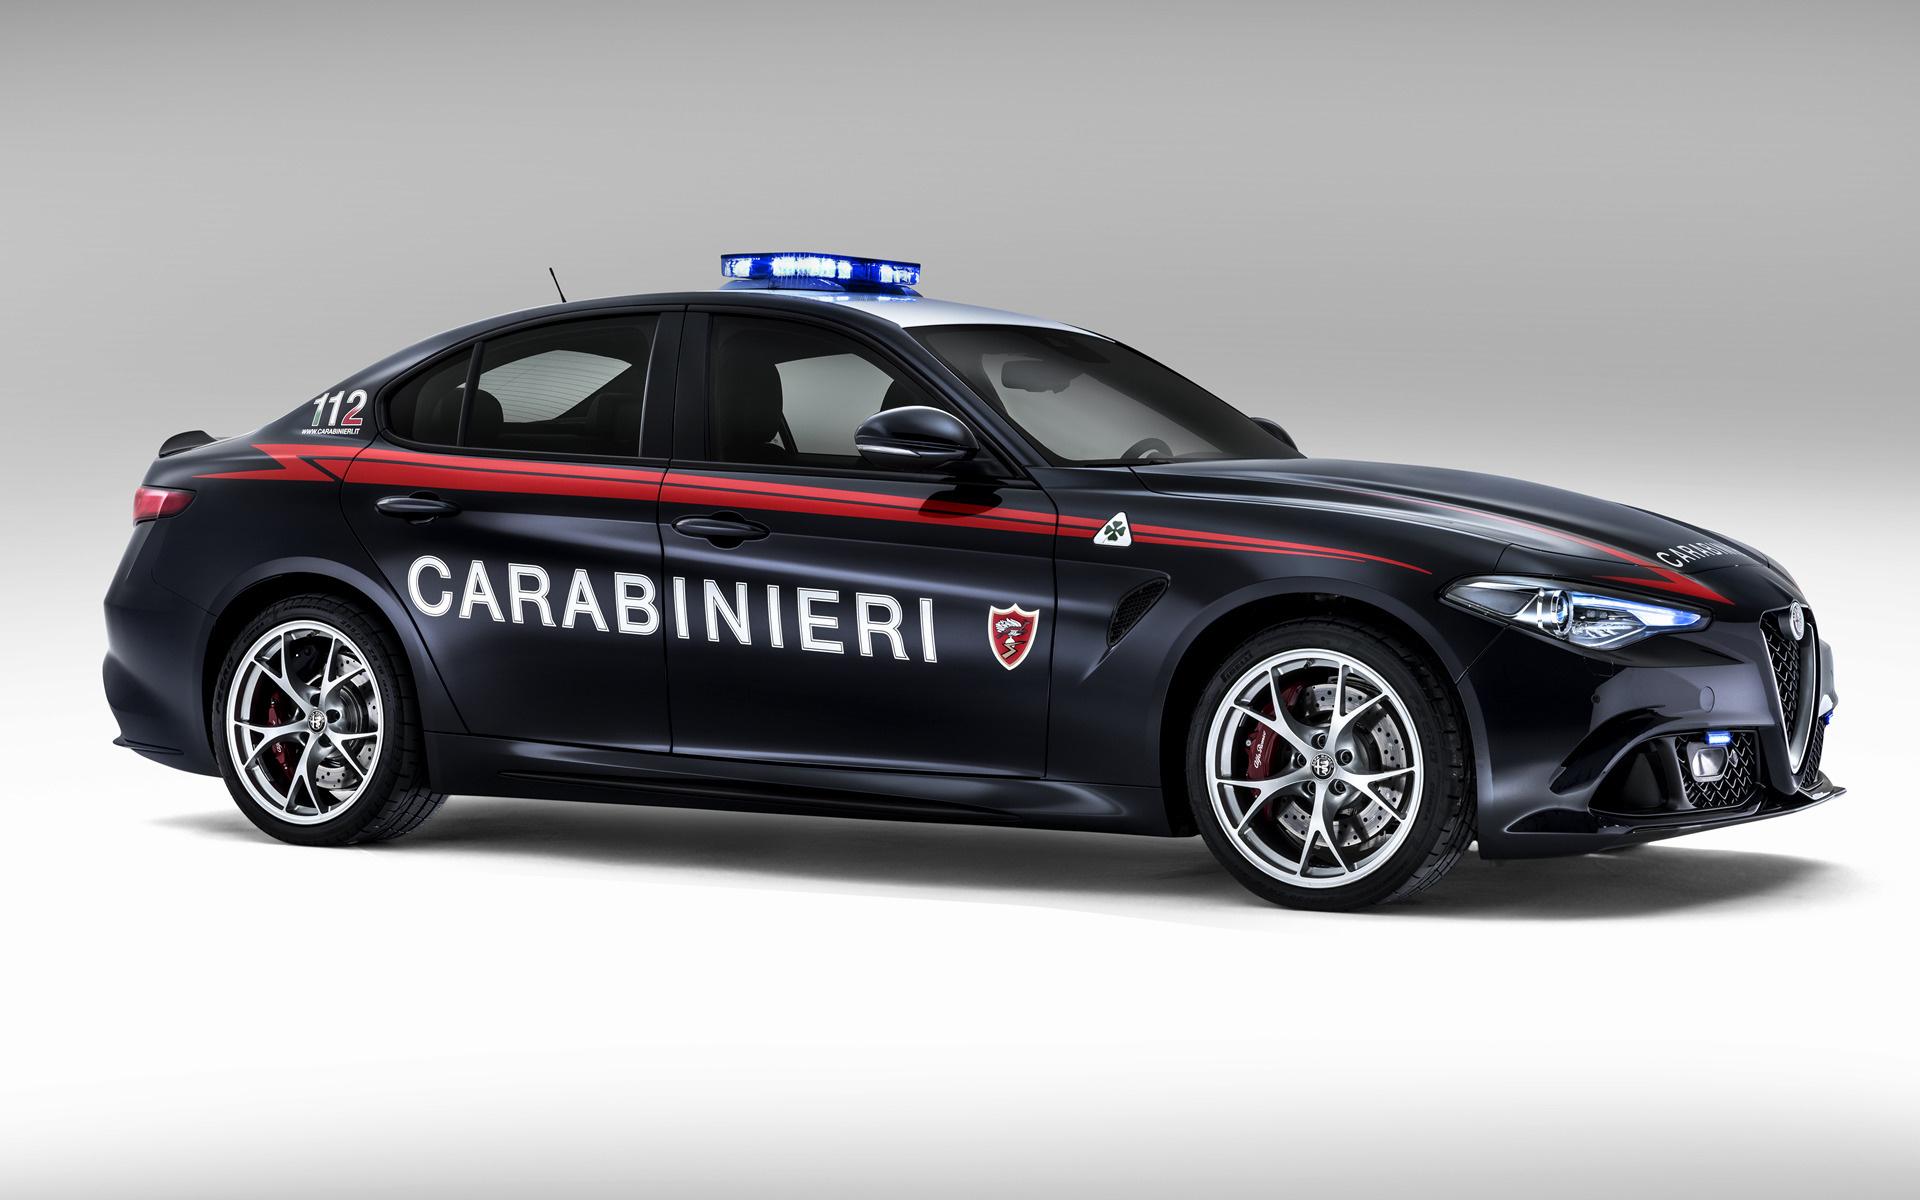 alfa romeo giulia quadrifoglio carabinieri  2016  wallpapers and hd images